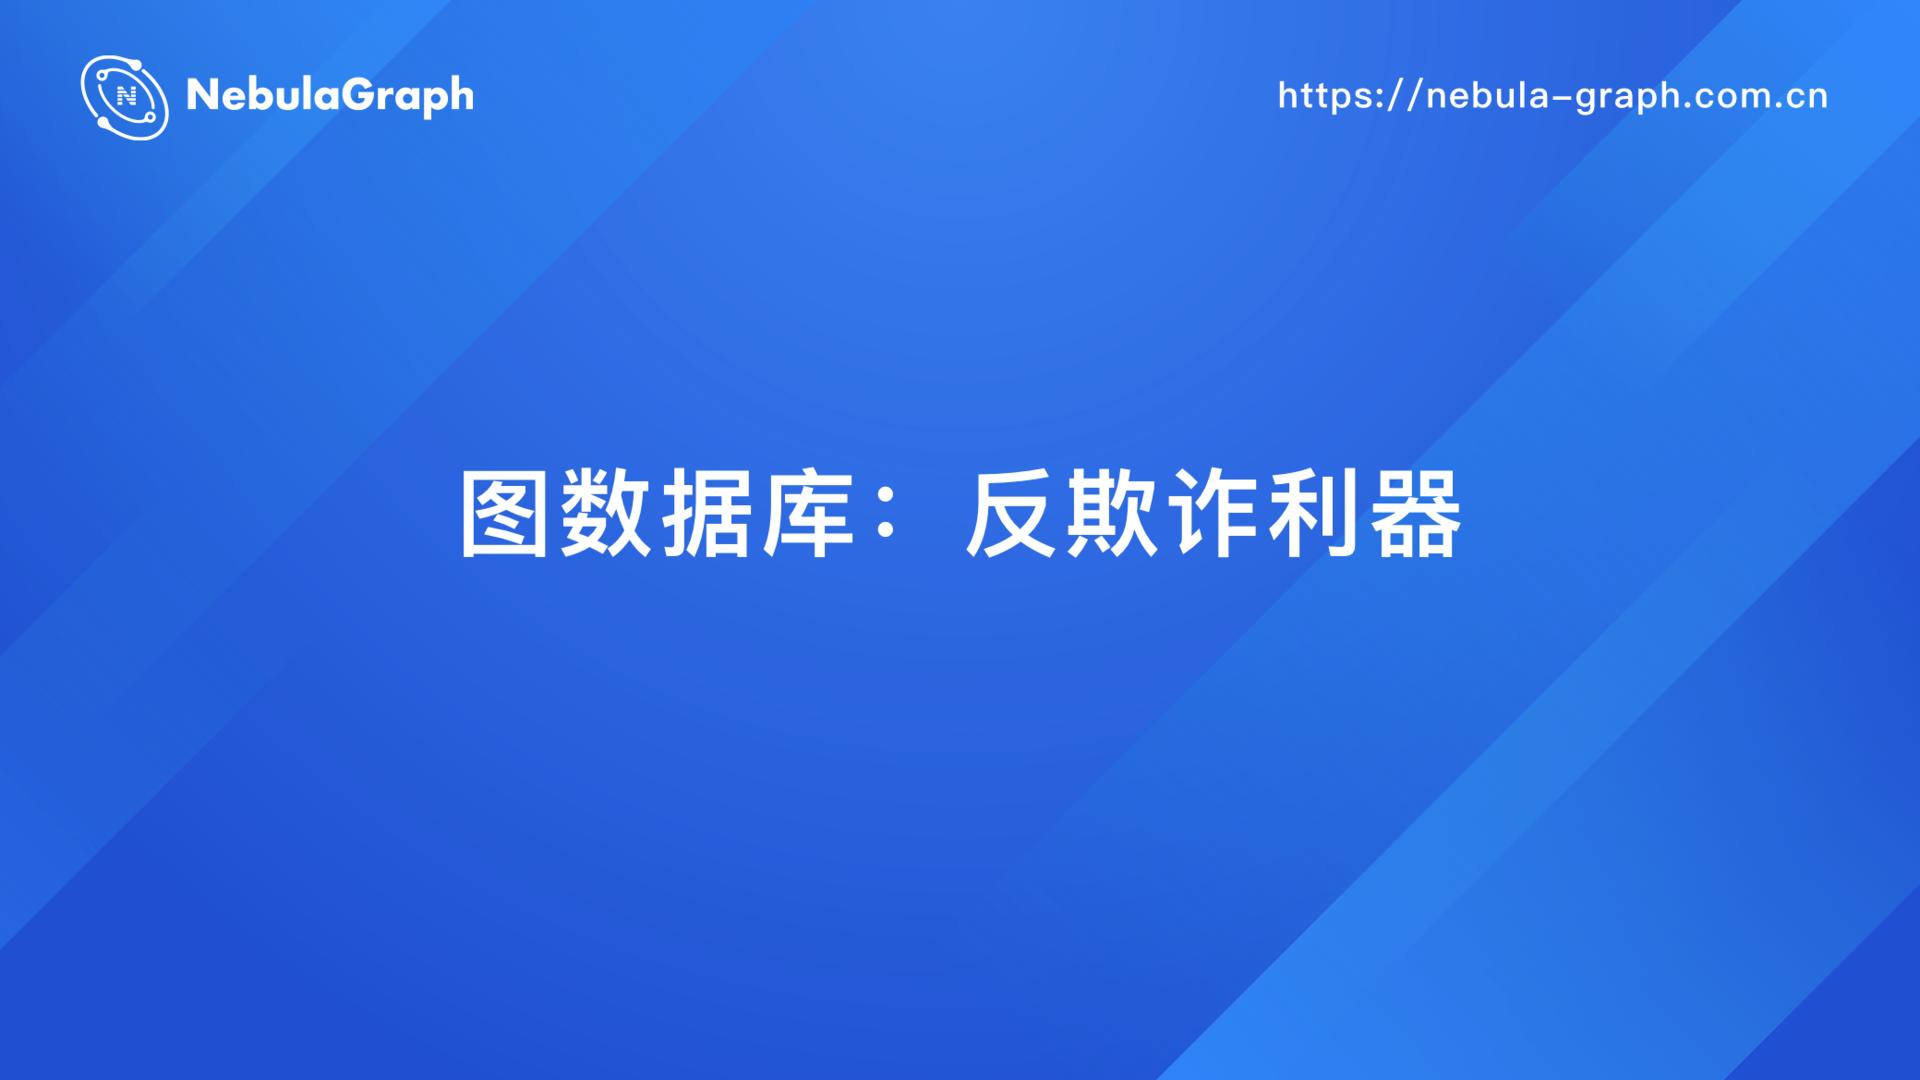 Presentation of 360 DigiTech at Nebula Graph Meetup Shenzhen